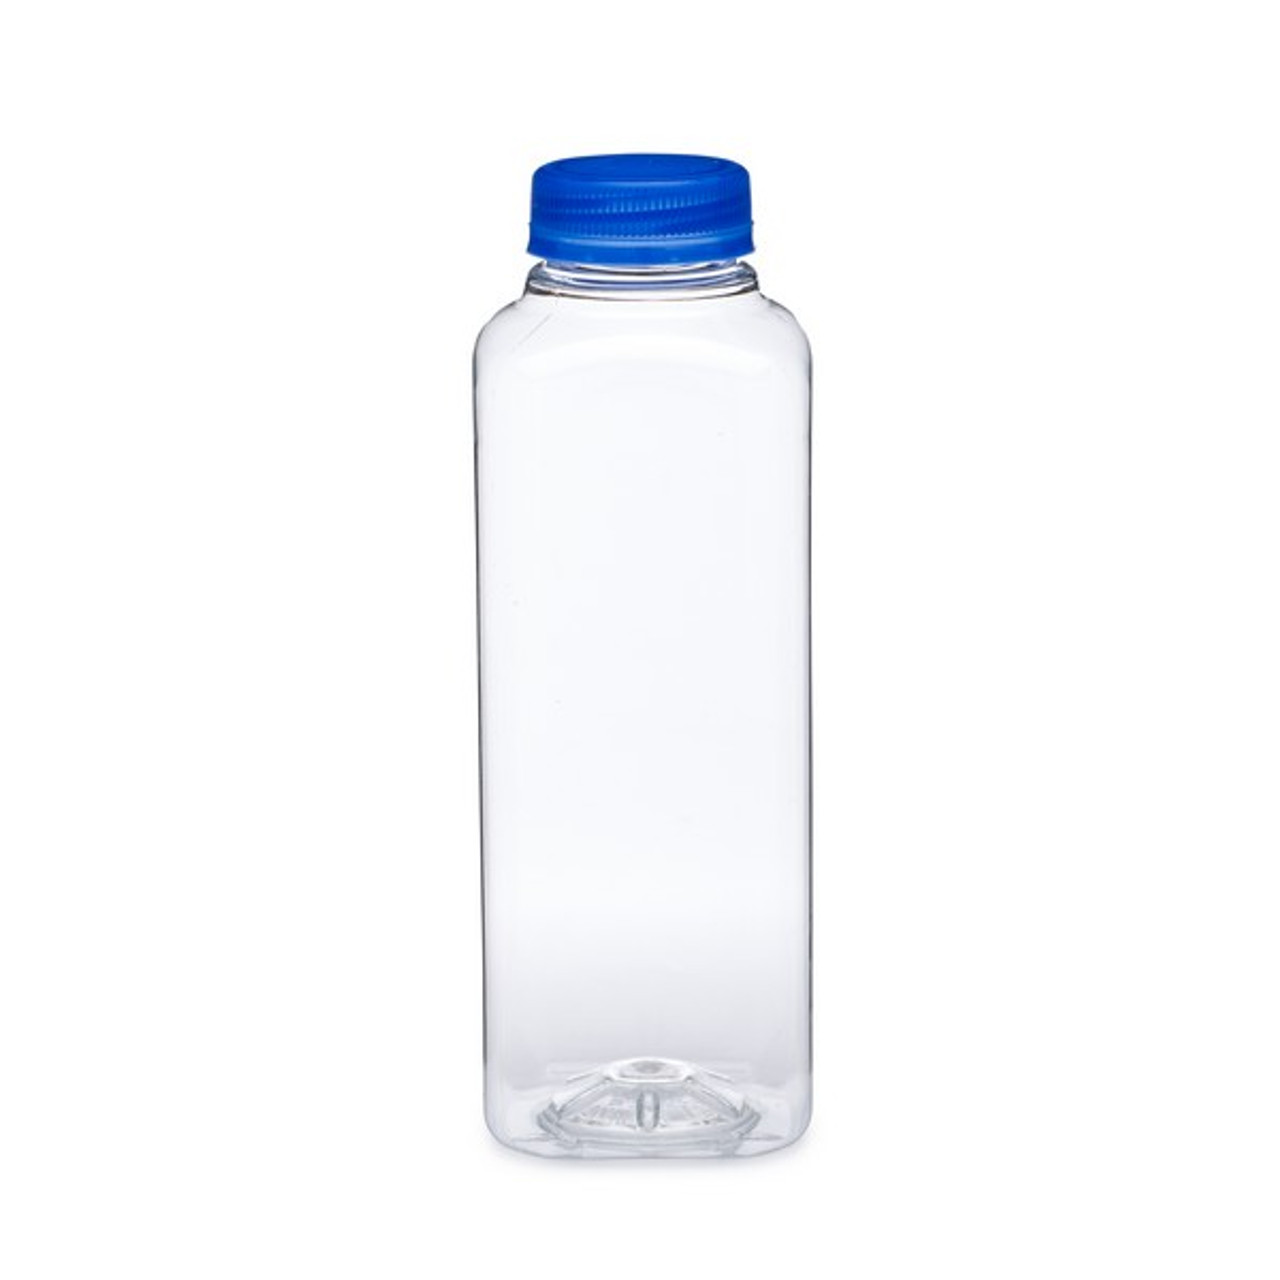 16oz Clear Pet Square Beverage Bottles Blue Cap Berlin